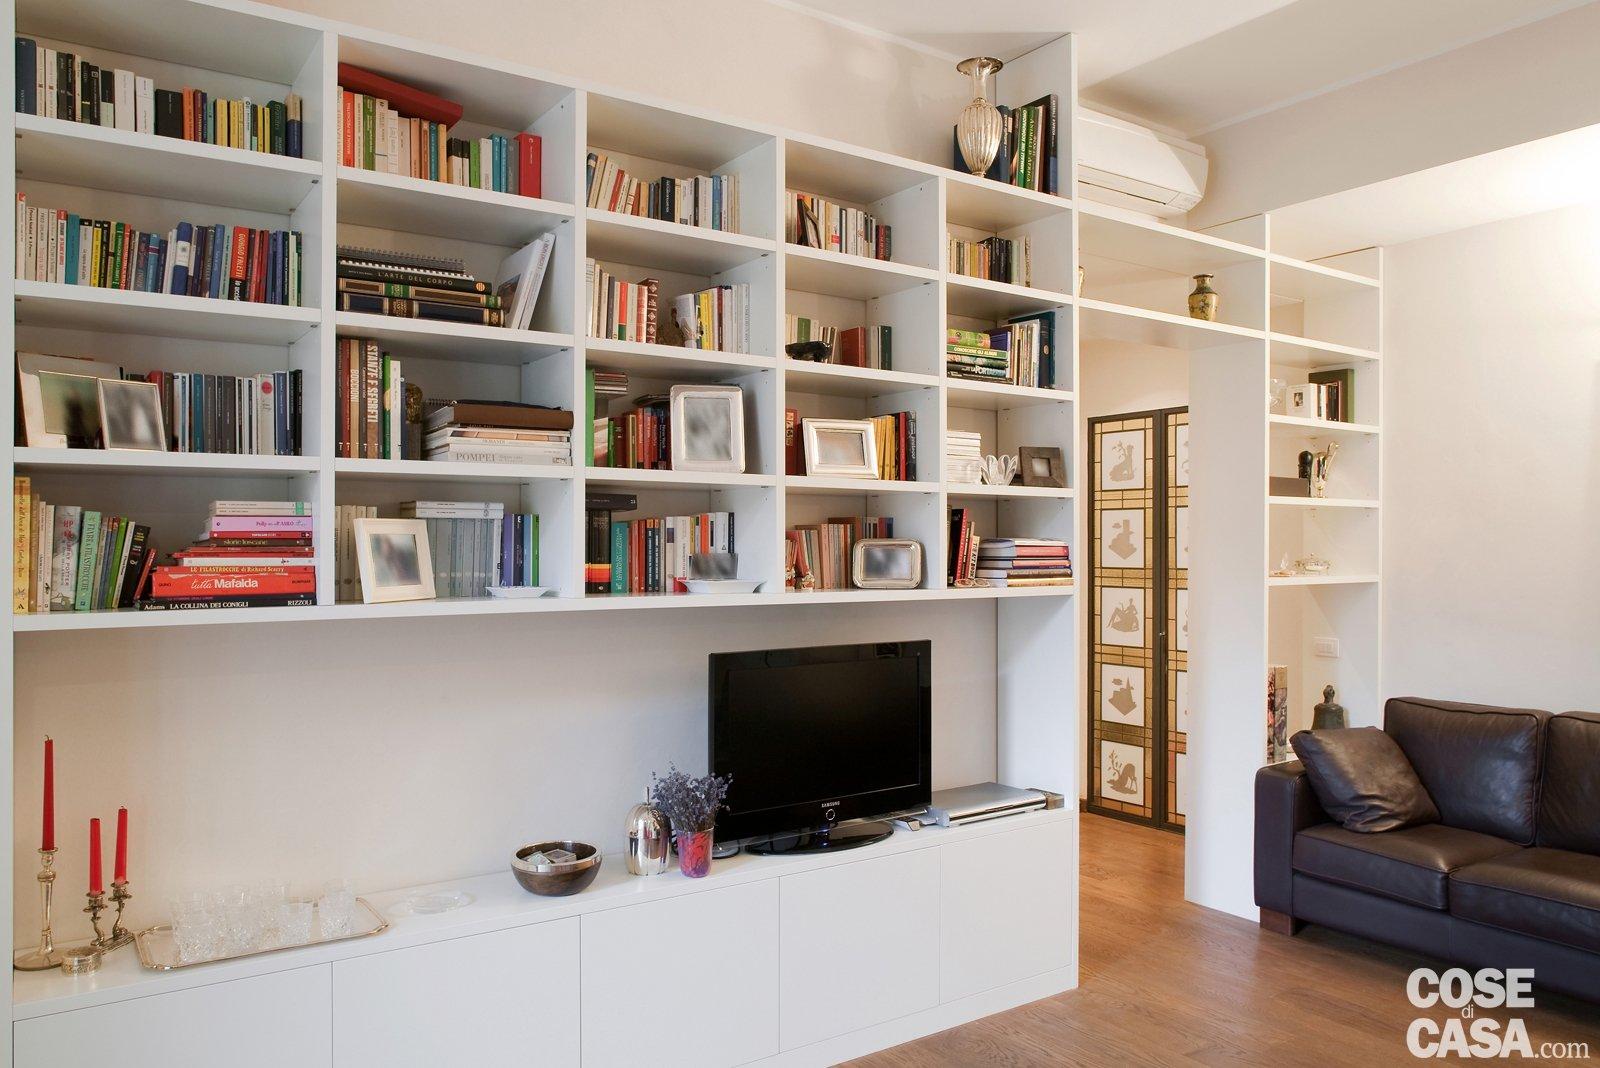 Una Casa Di 80 Mq Superfunzionali Cose Di Casa #A43227 1600 1068 Come Arredare Una Cucina Salotto